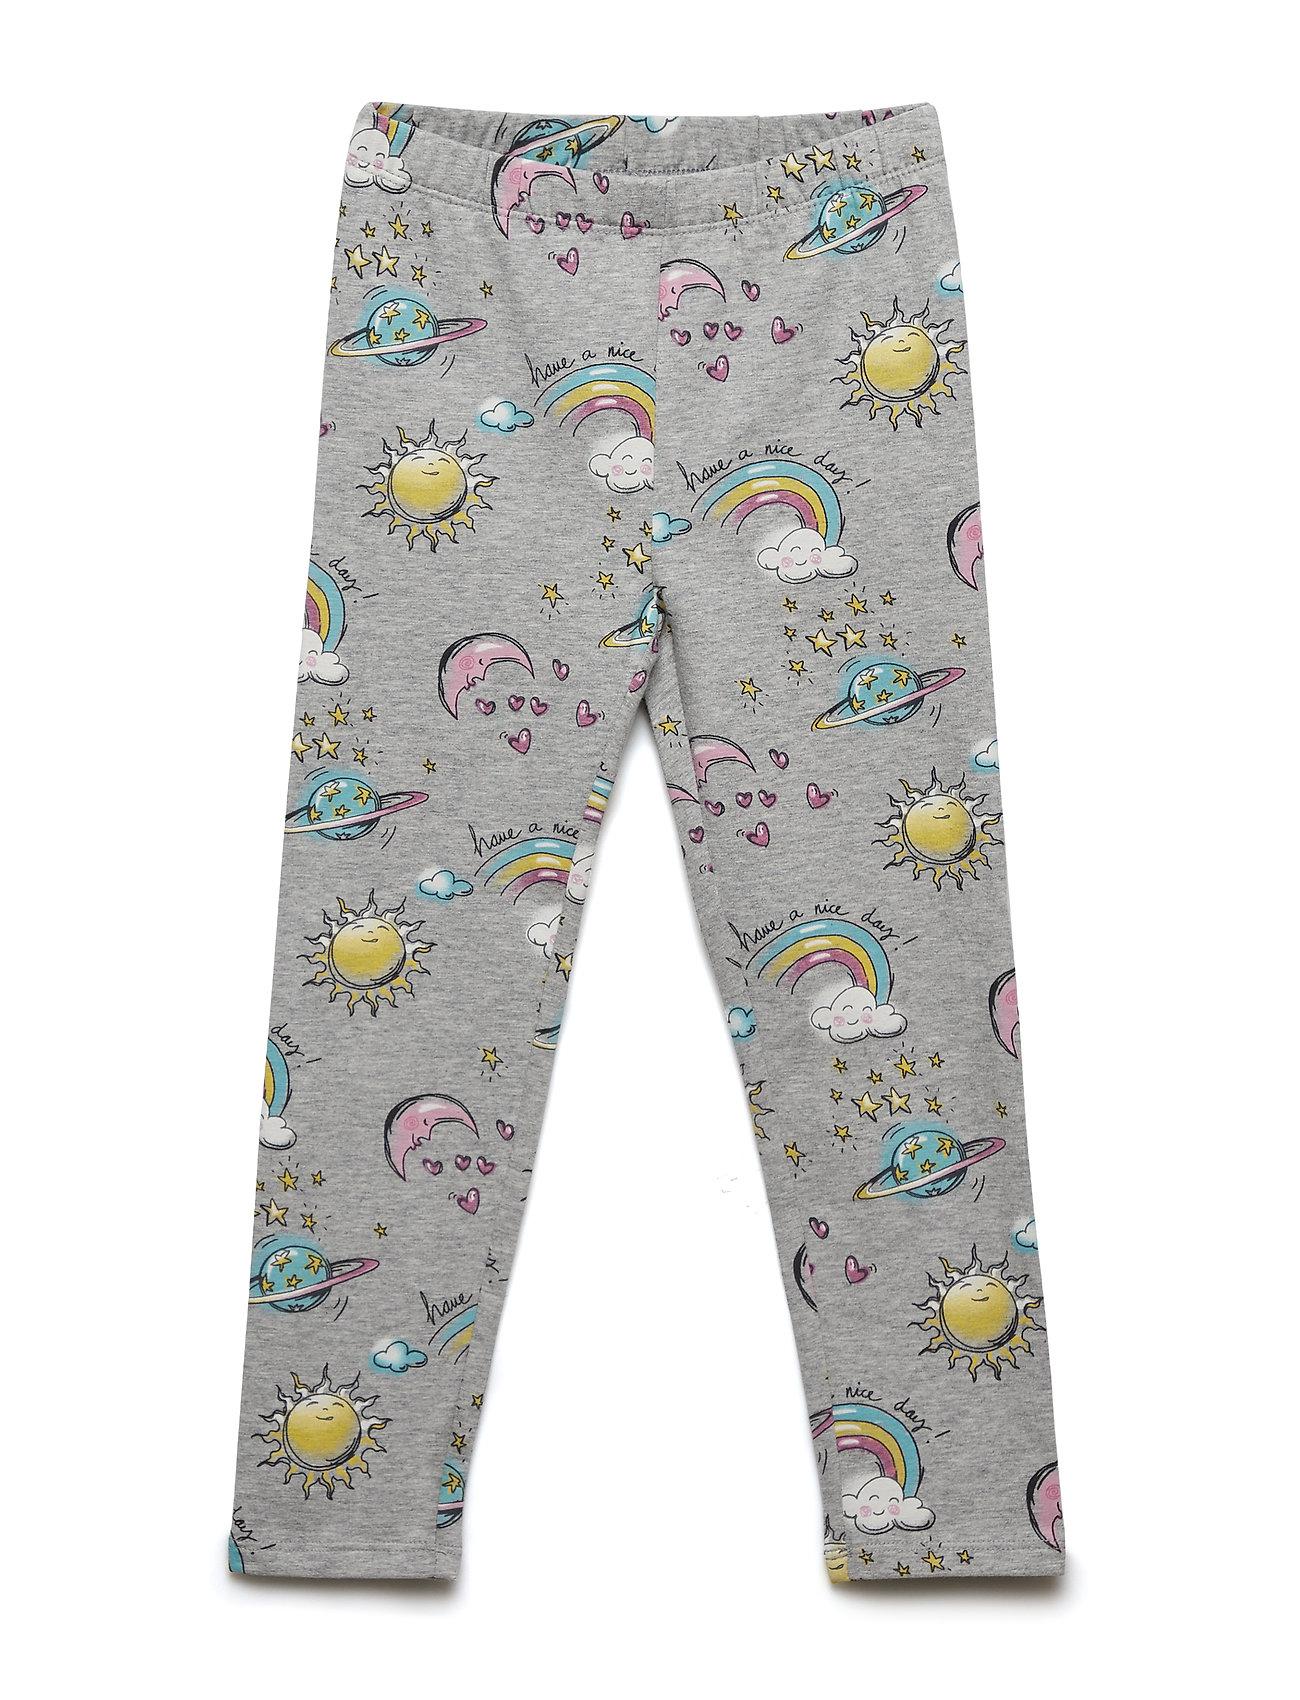 19349cf1d0953 Toddler Print Leggings In Stretch Jersey (Sky 316) (7 €) - GAP ...